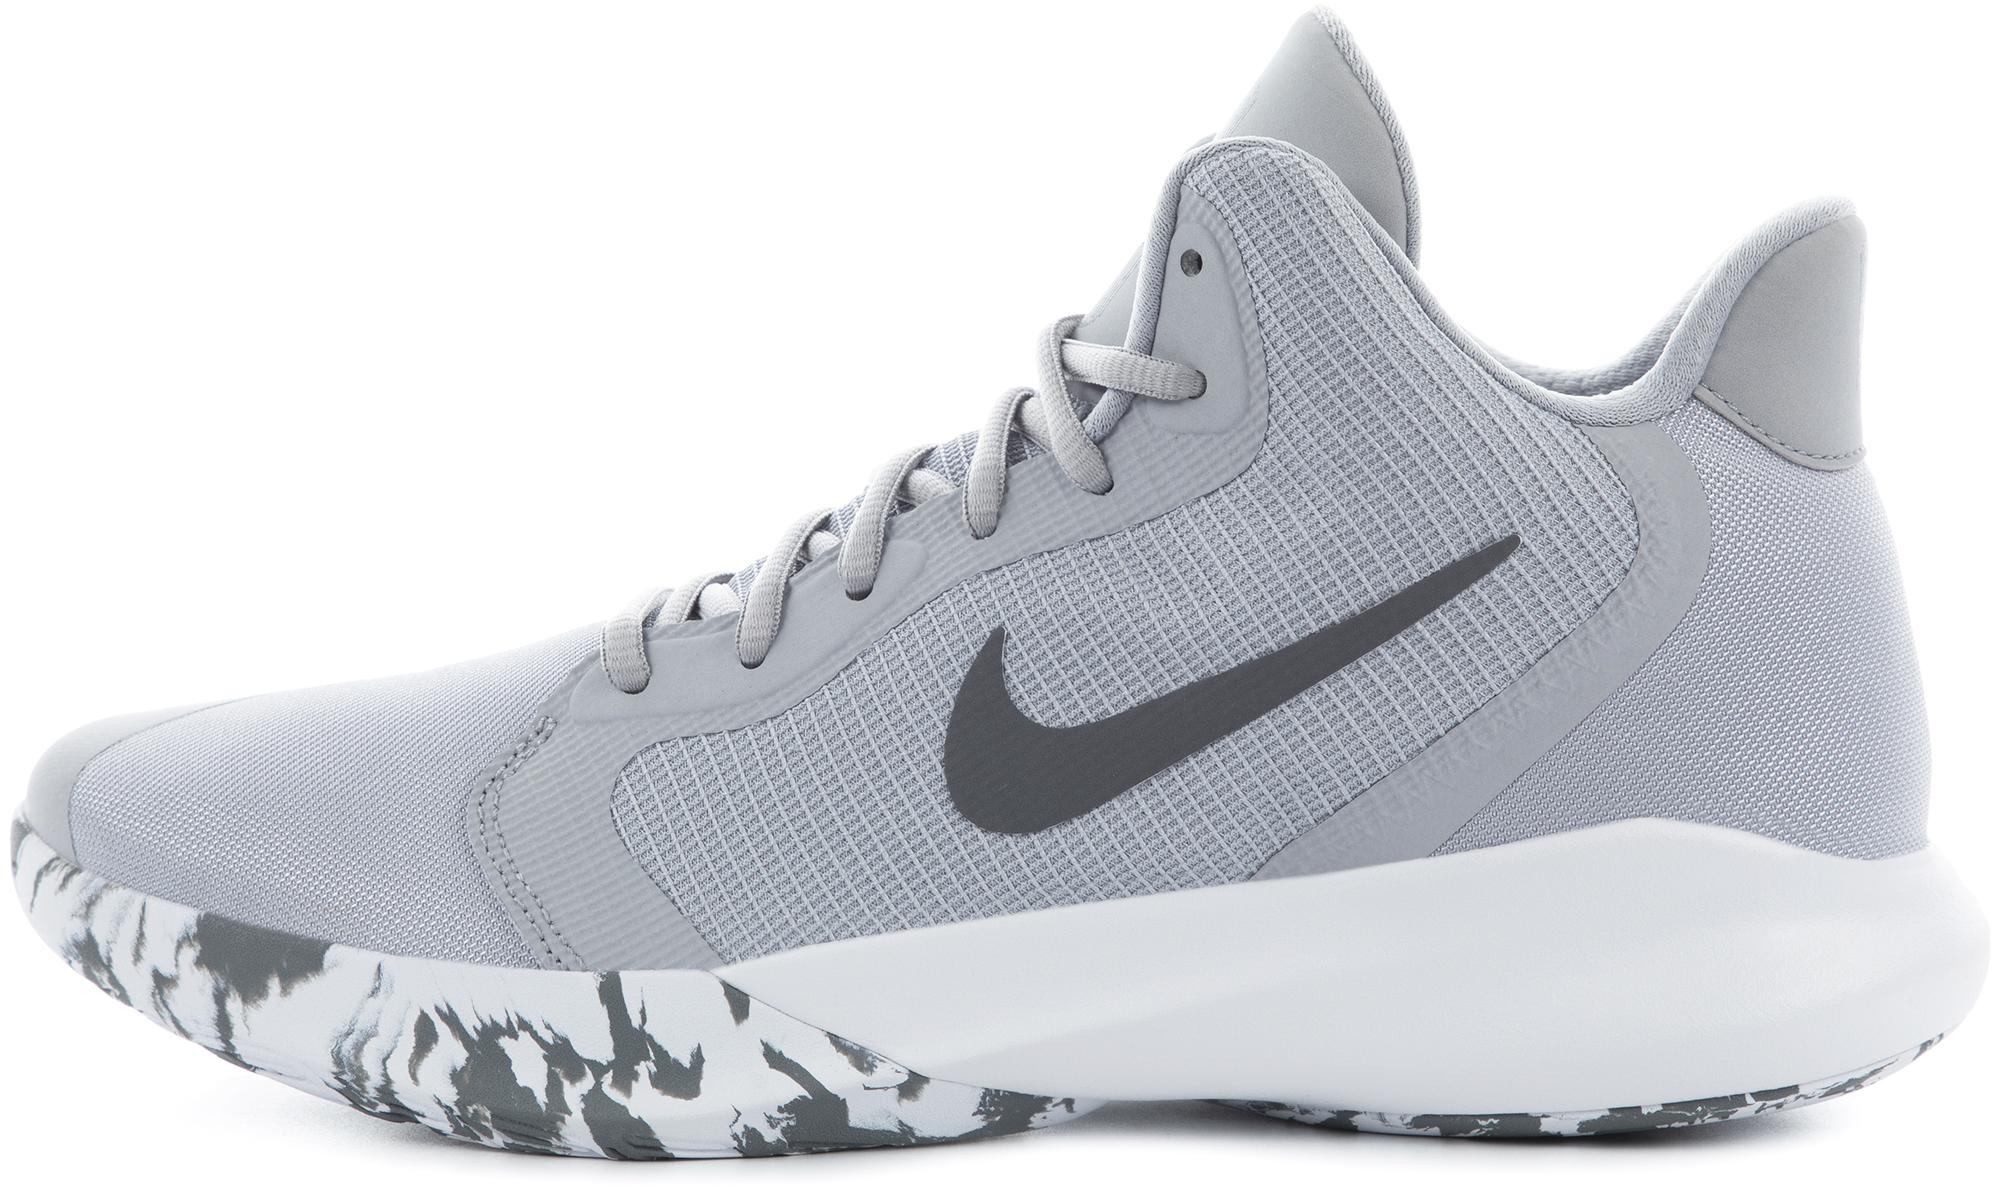 Nike Кроссовки мужские Precision Iii, размер 46,5